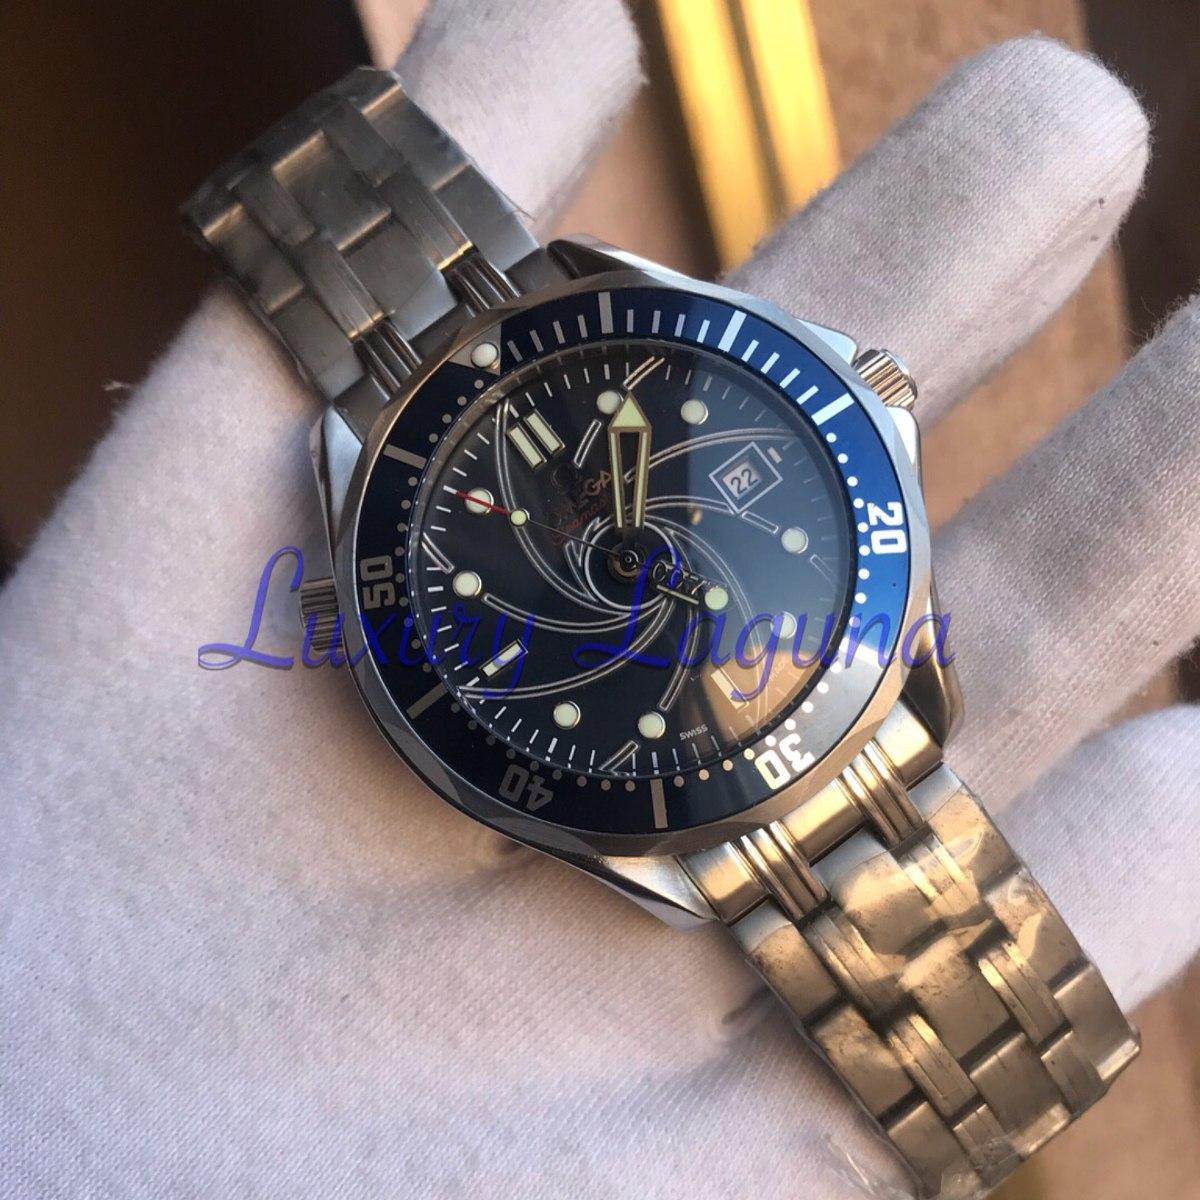 código promocional 66fe2 9aacb Reloj Omega Seamaster 007 James Bond Edition